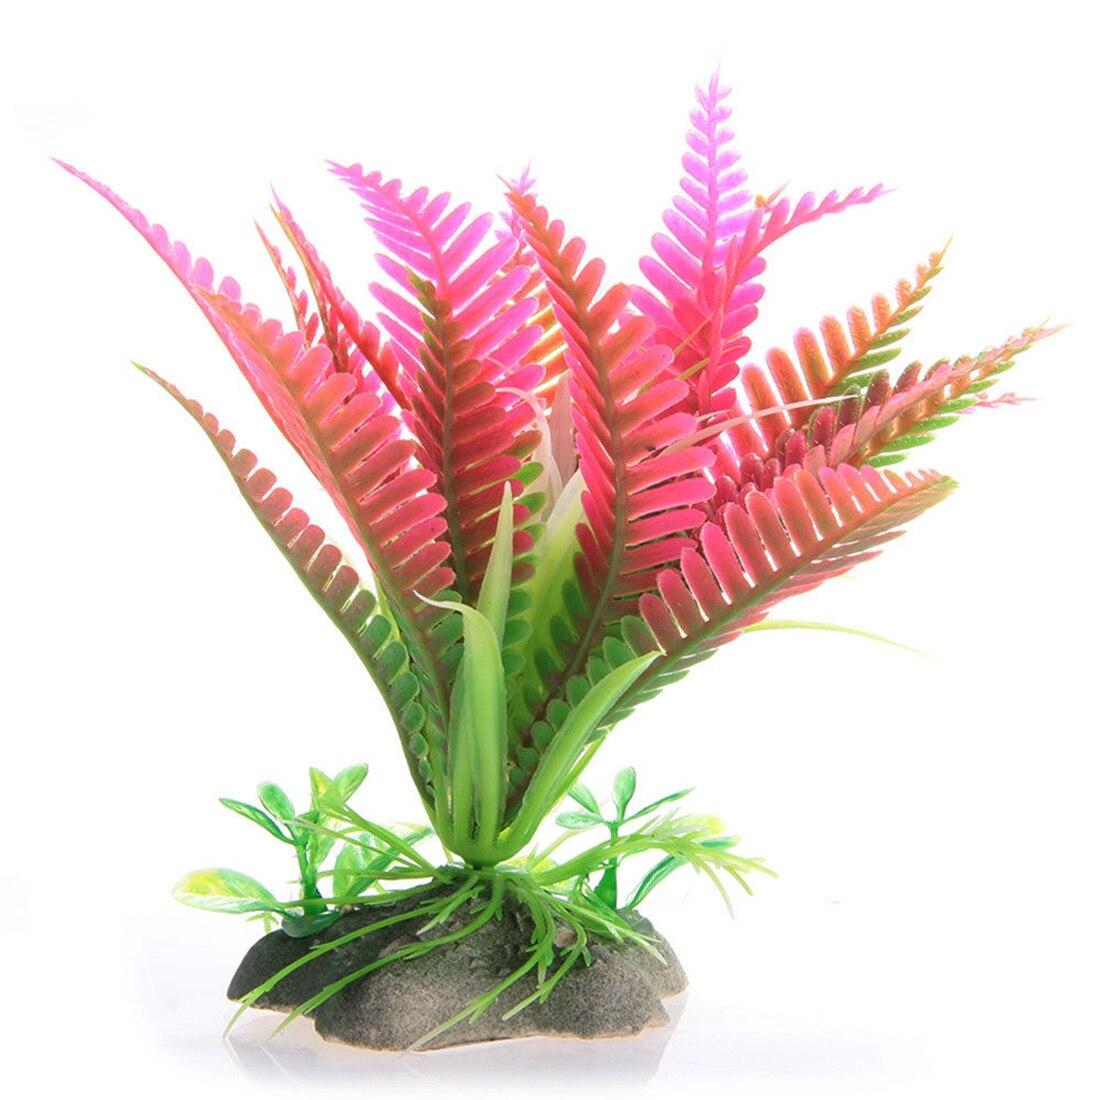 Plastic Simulation Plant Artificial Succulents Christmas Flowers Aquarium Ornament Plastic